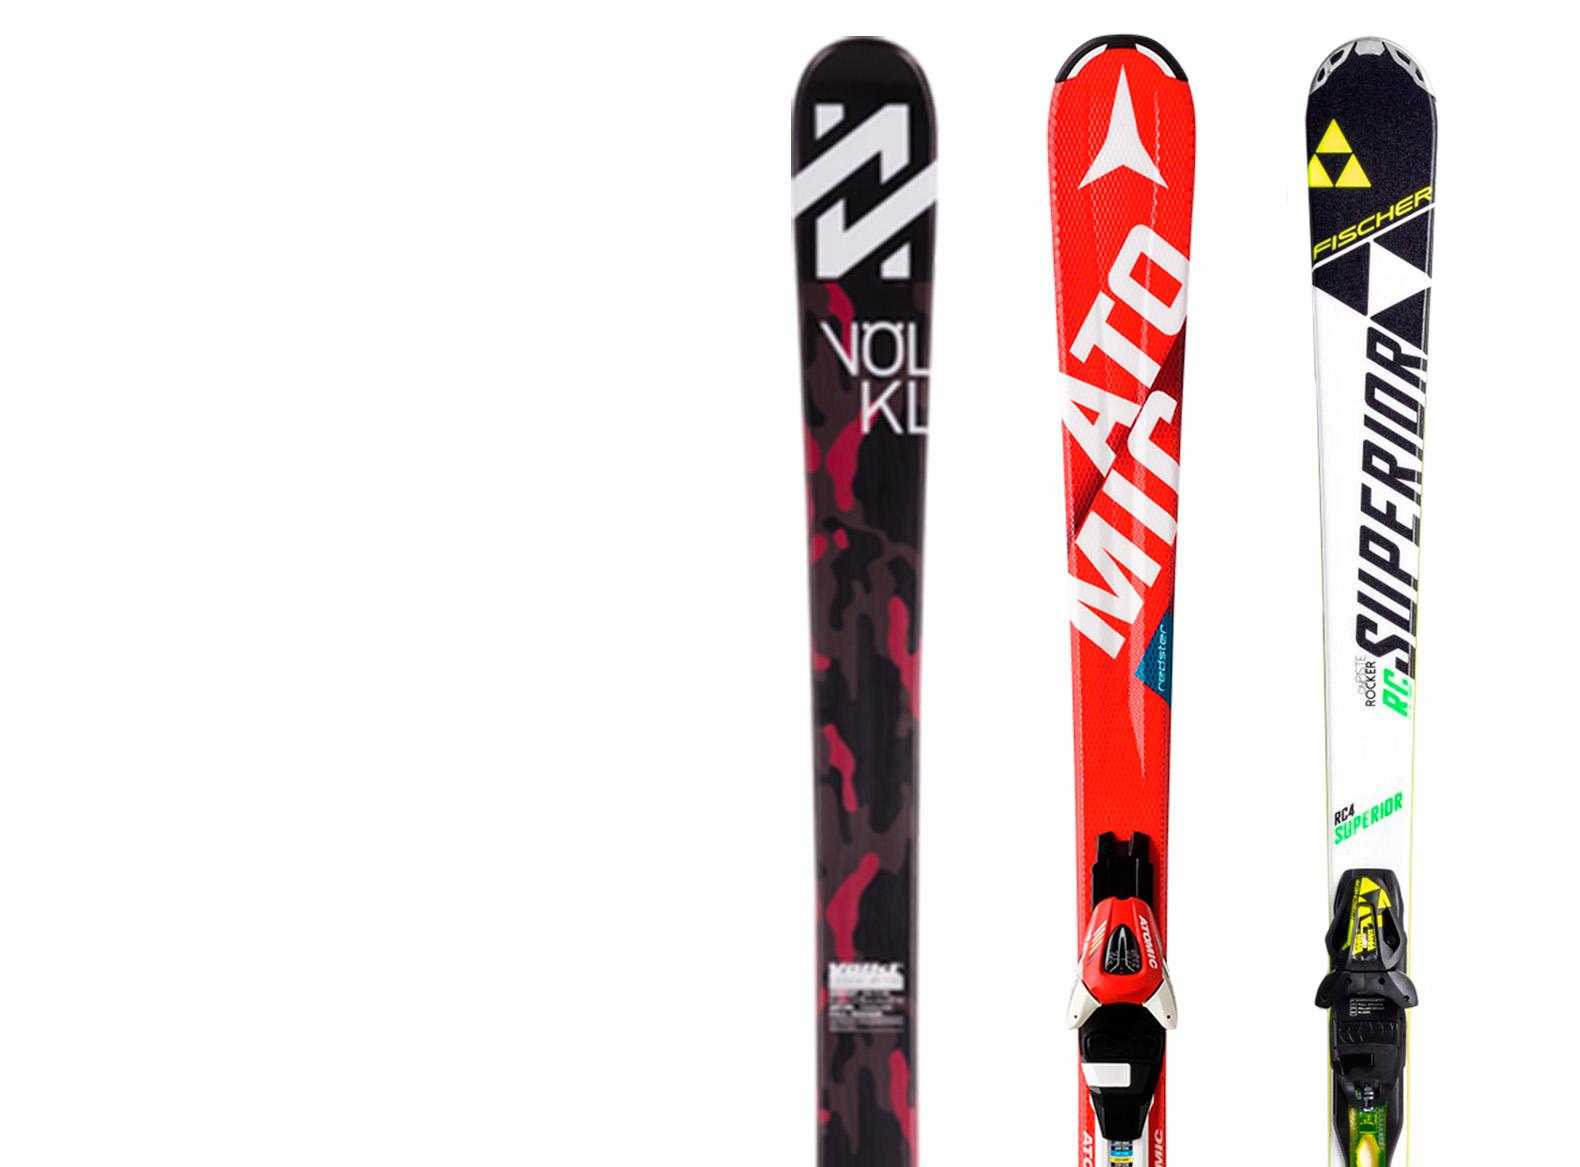 SKI-Kids-kinder-Rent-sport-SAILER-Seefeld-Rosshuette-Tirol-Oesterreich-003